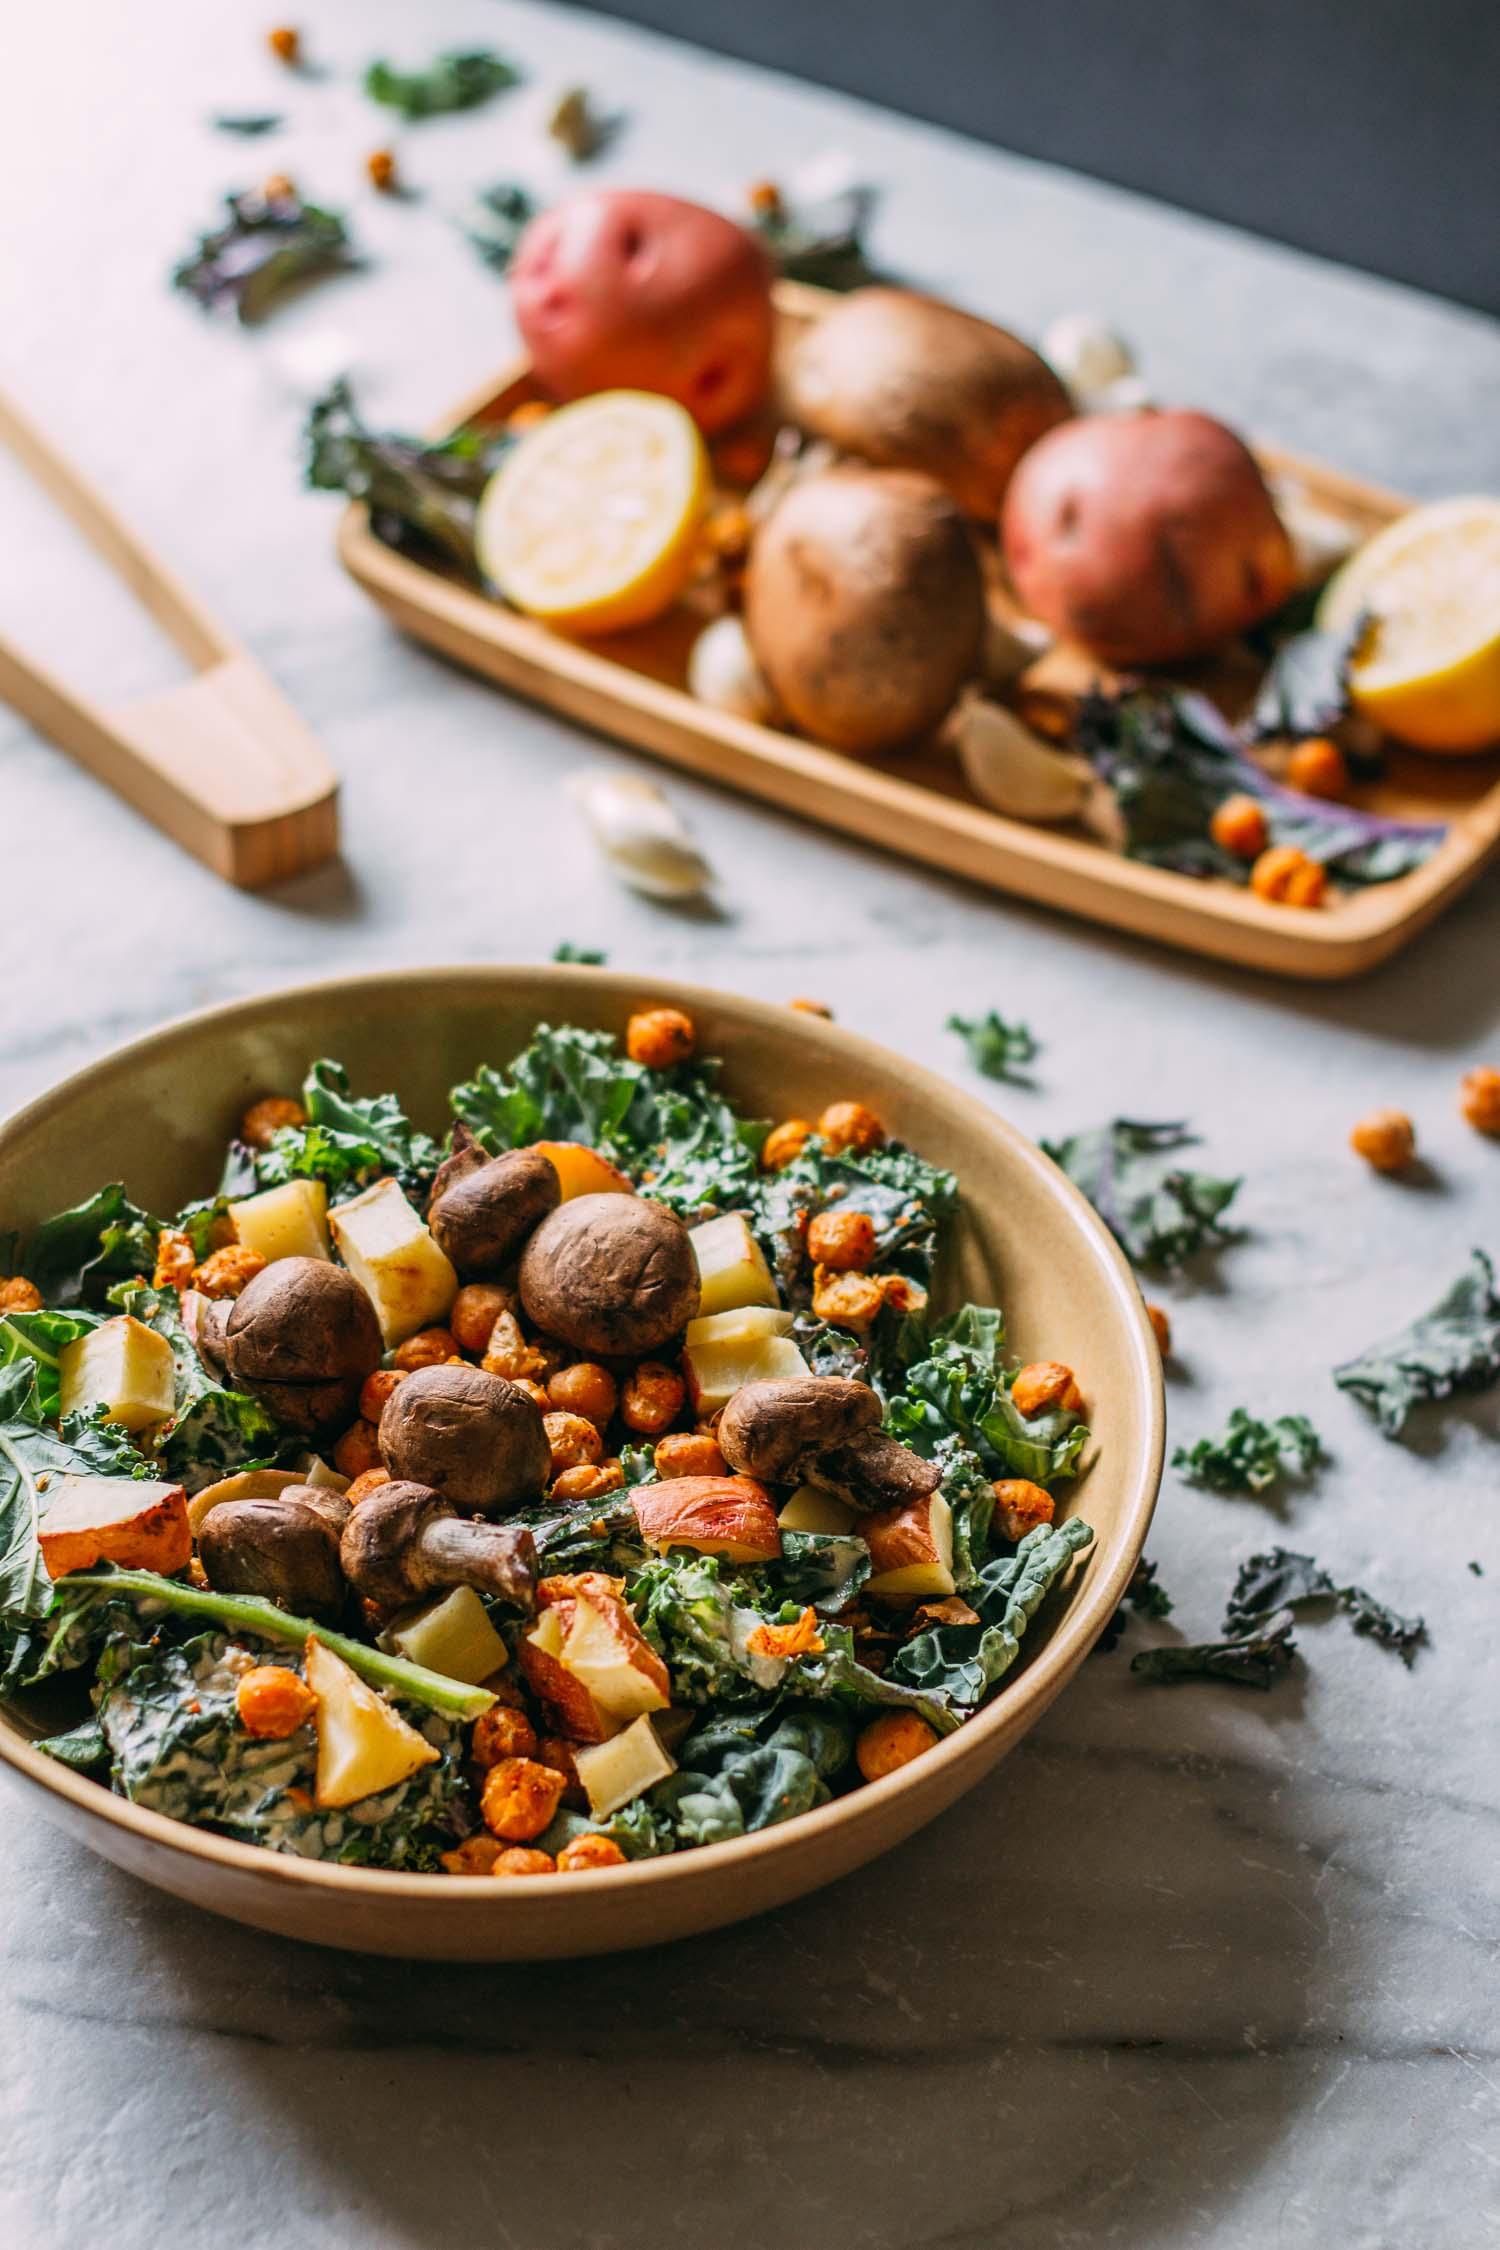 Roasted Steak-y Mushroom Kale Salad #protein #vegetarian #chickpeas #wfpbno #lunch #cookout #sidedish